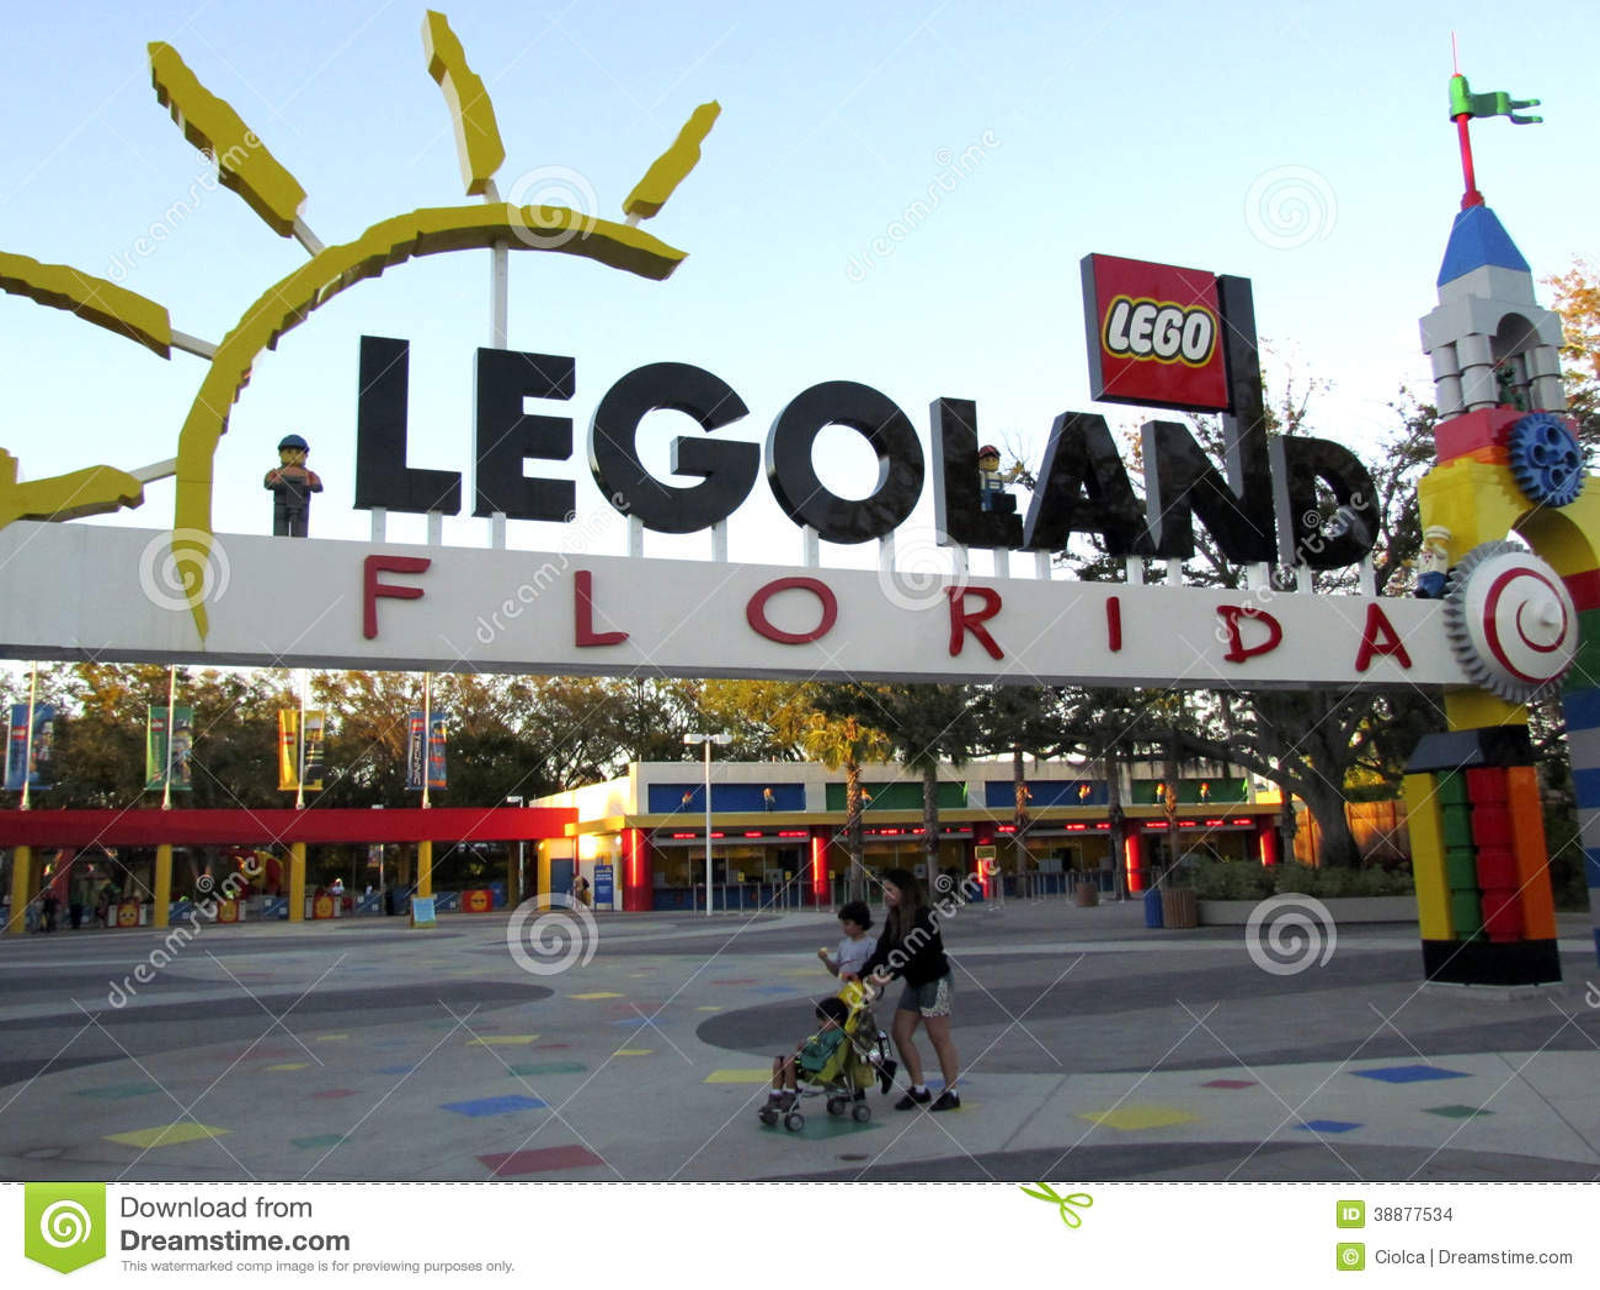 legoland florida editorial stock image image of haven 36181759